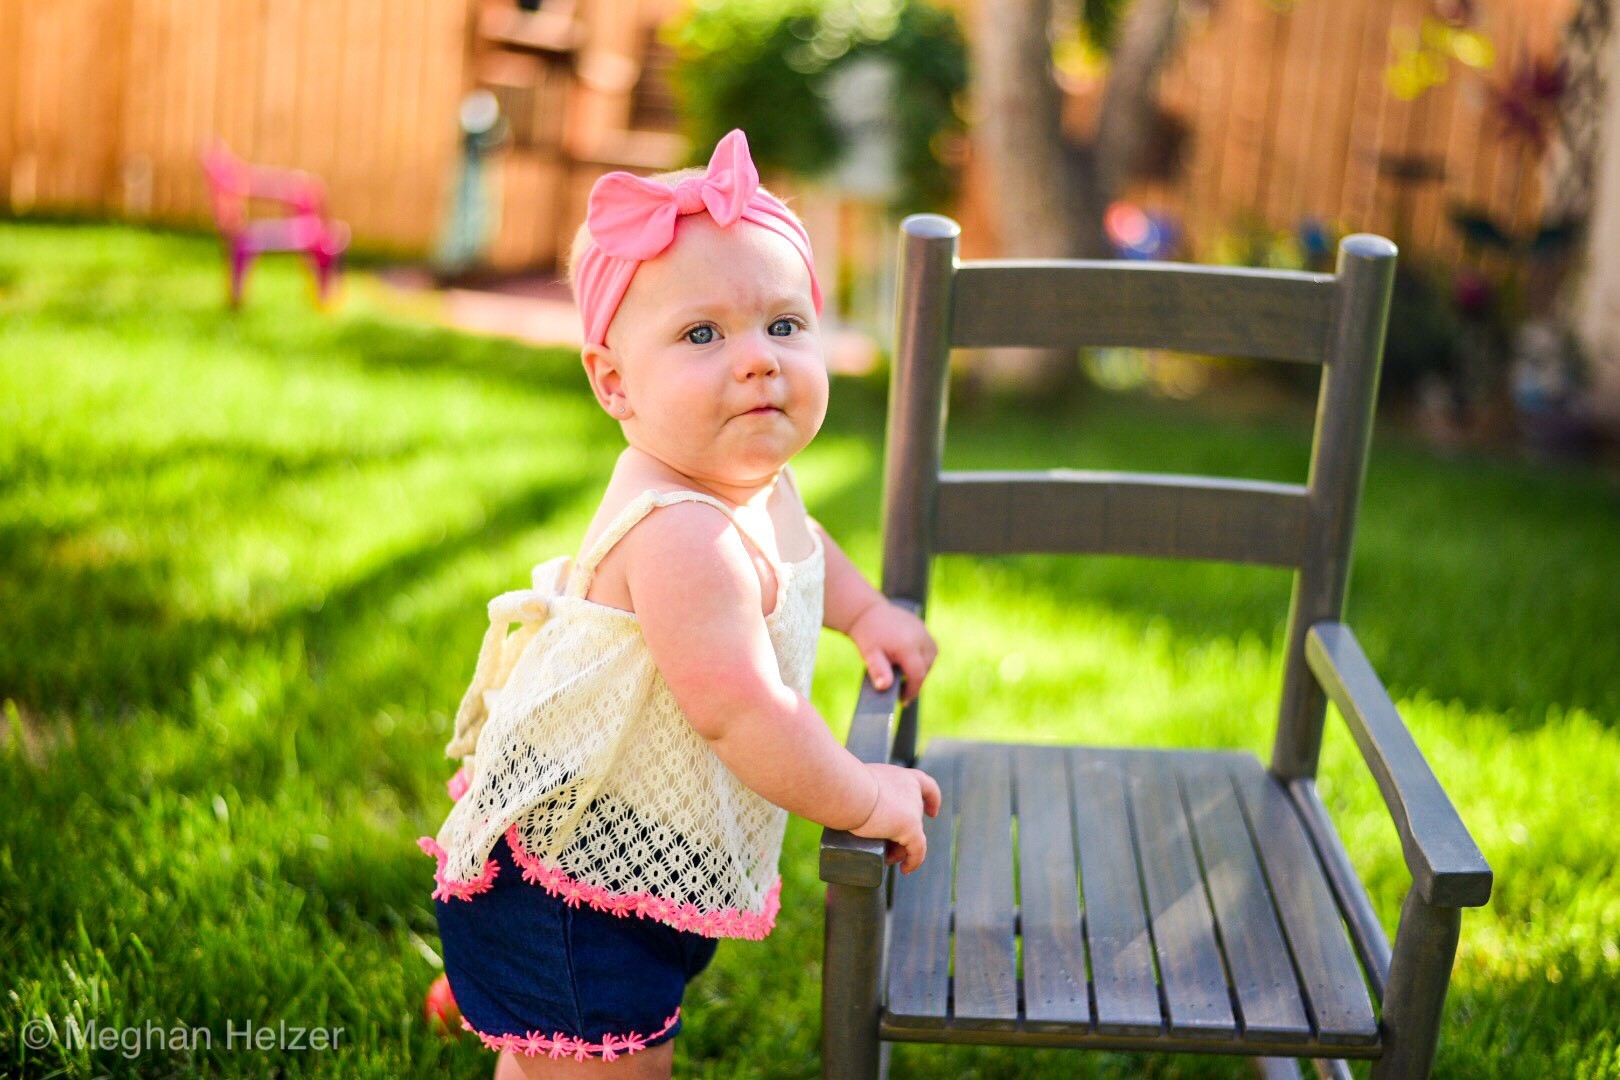 Penelope, Snowflake Baby #529